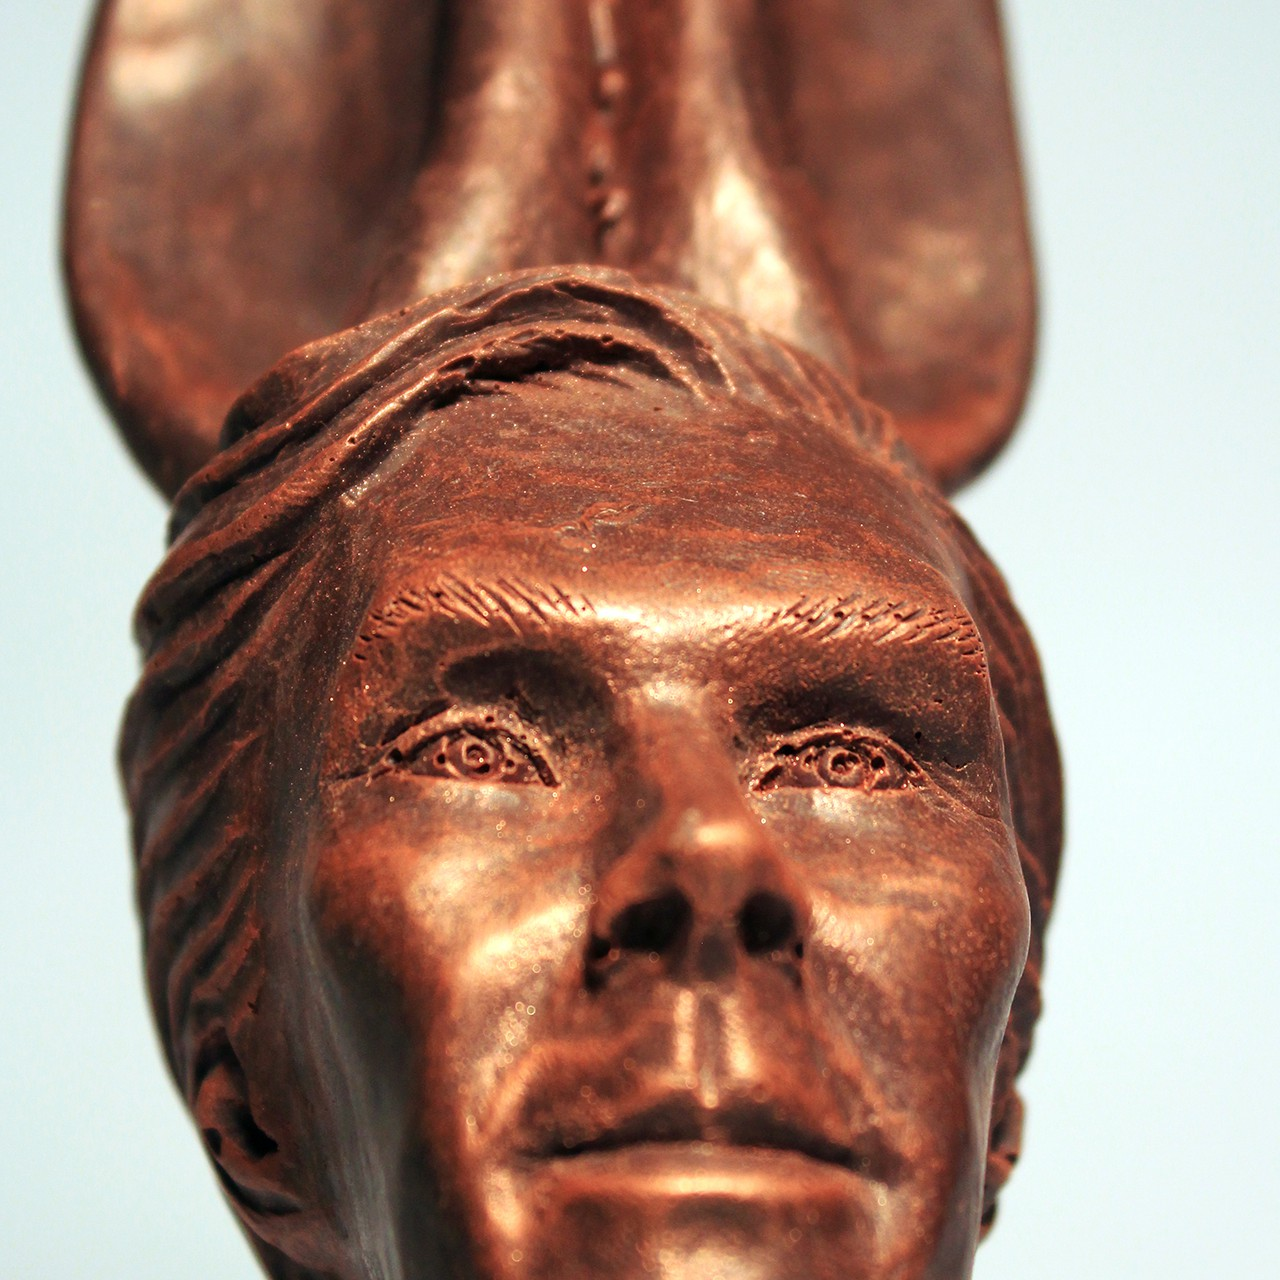 Chocolate Cumberbunny